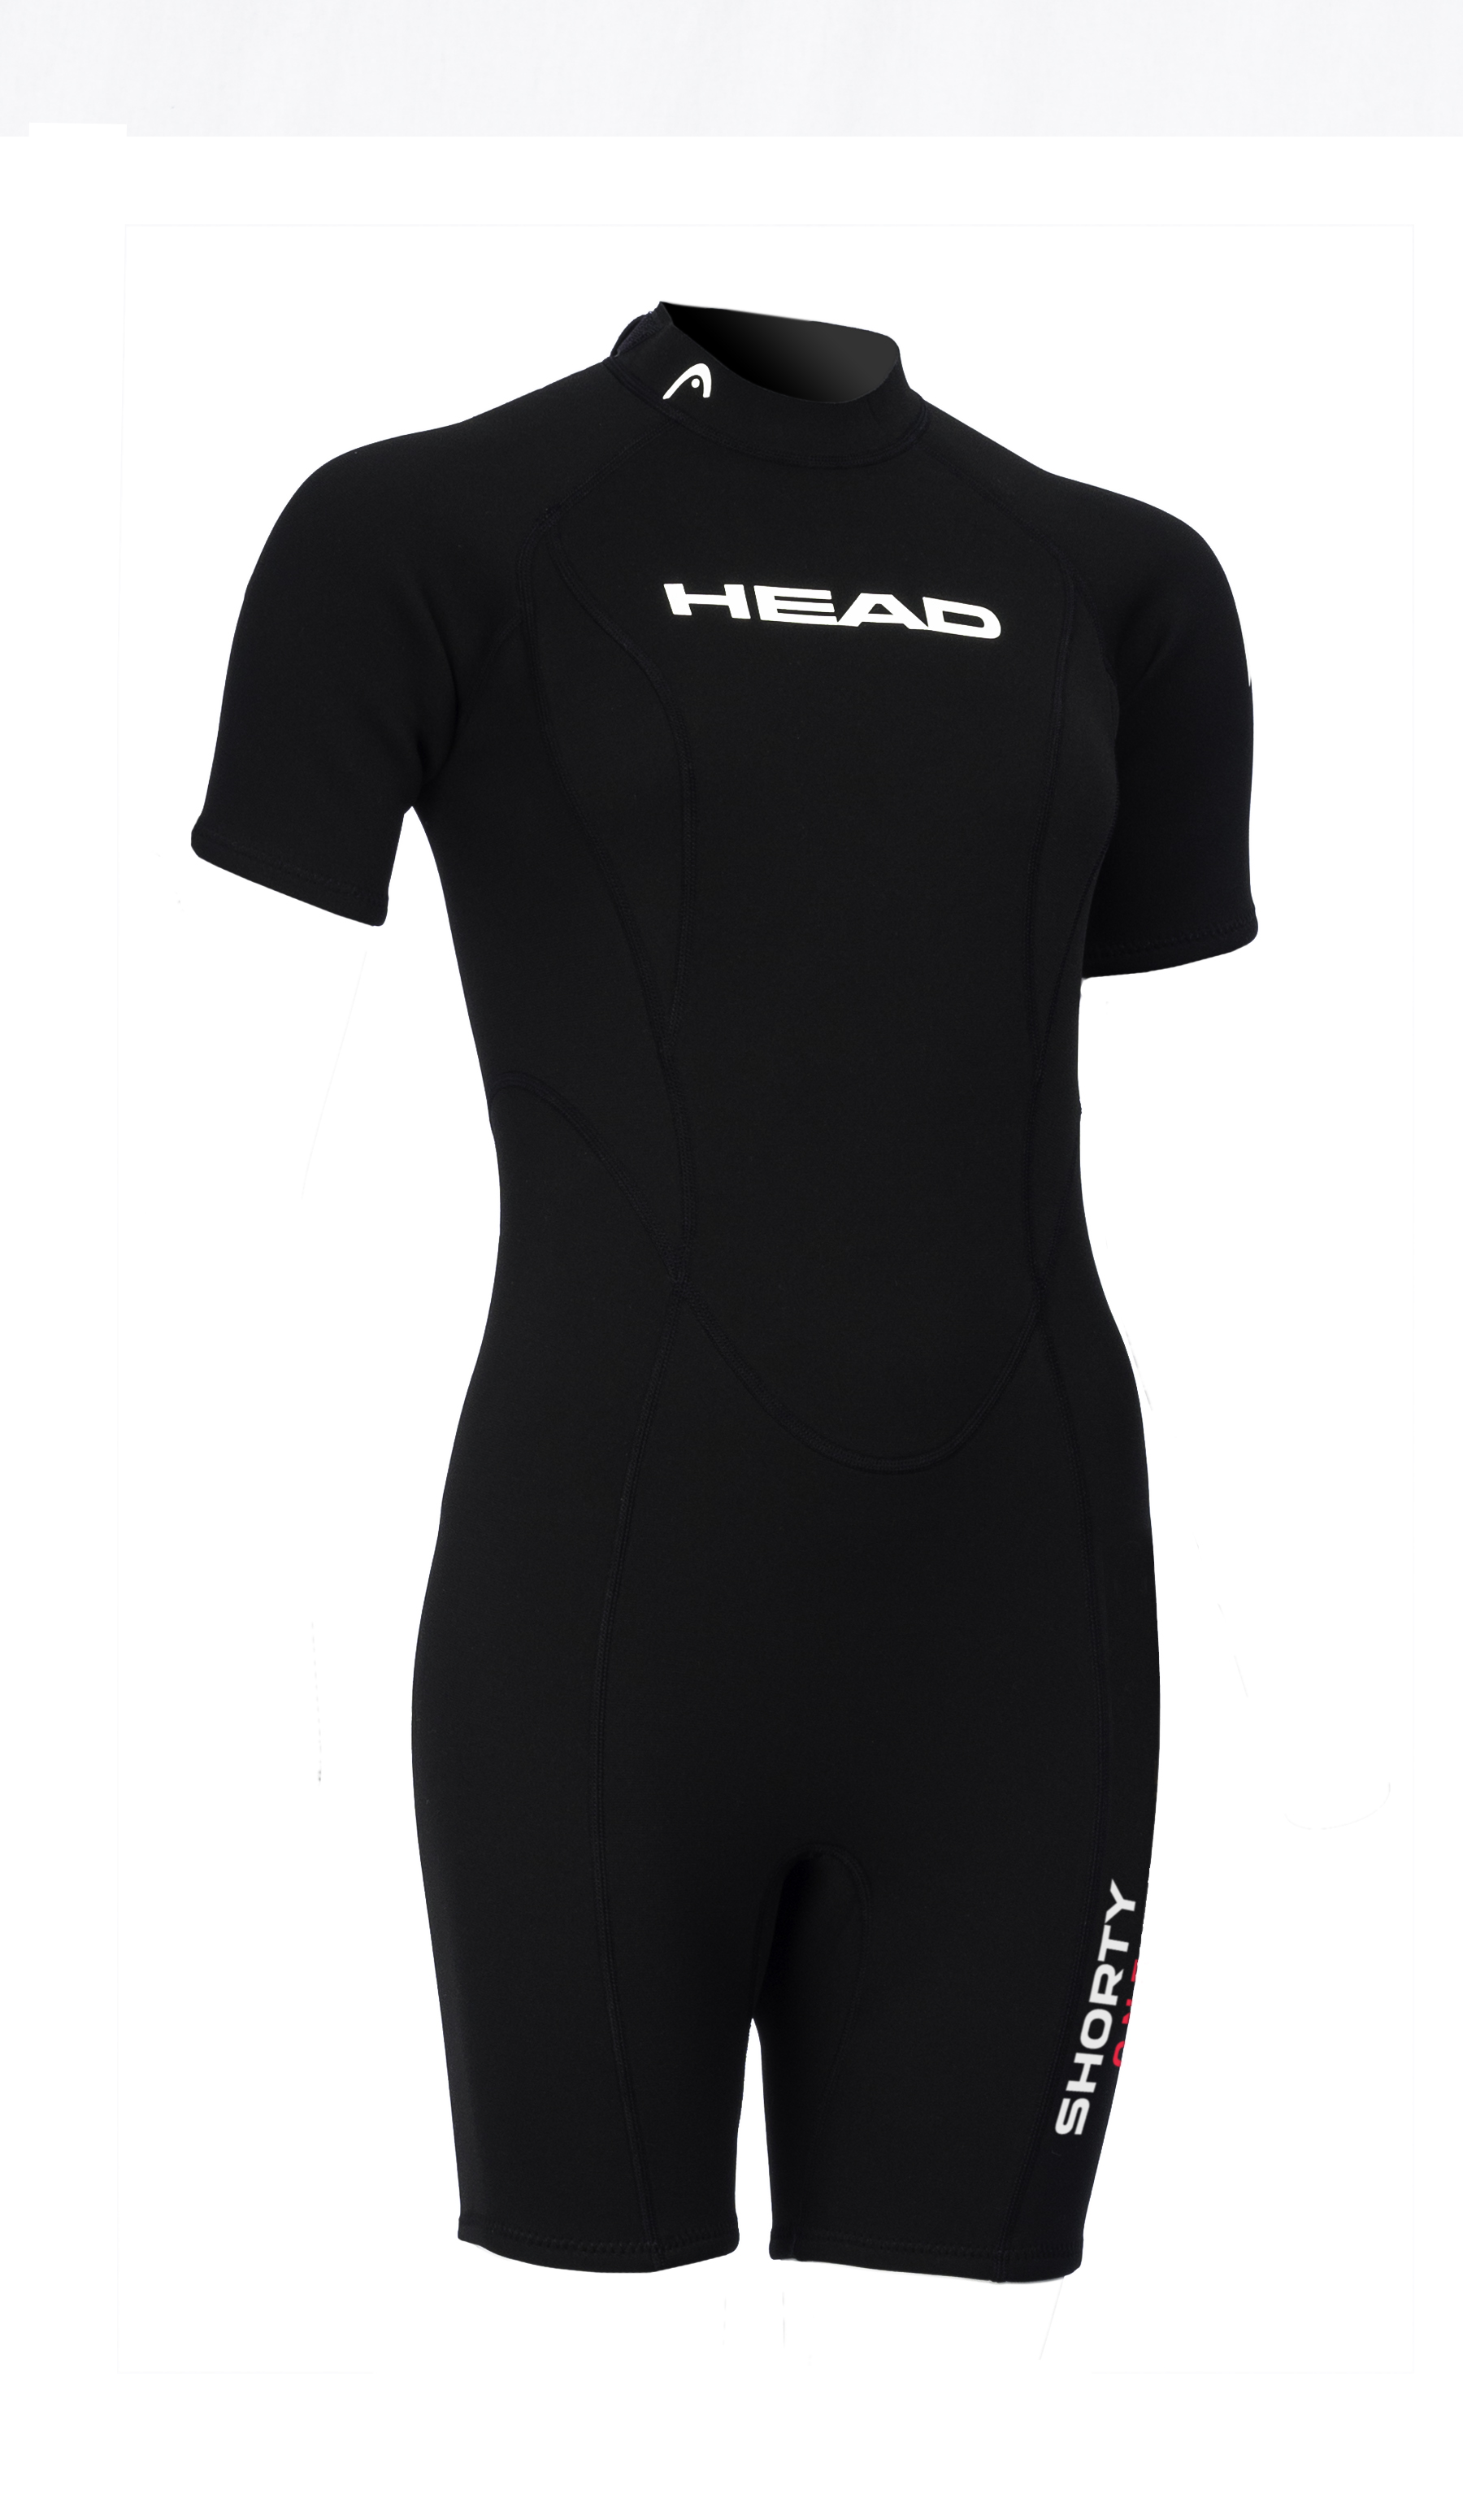 c55fc0d63 HEAD One Shorty 2,5mm Woman 2017